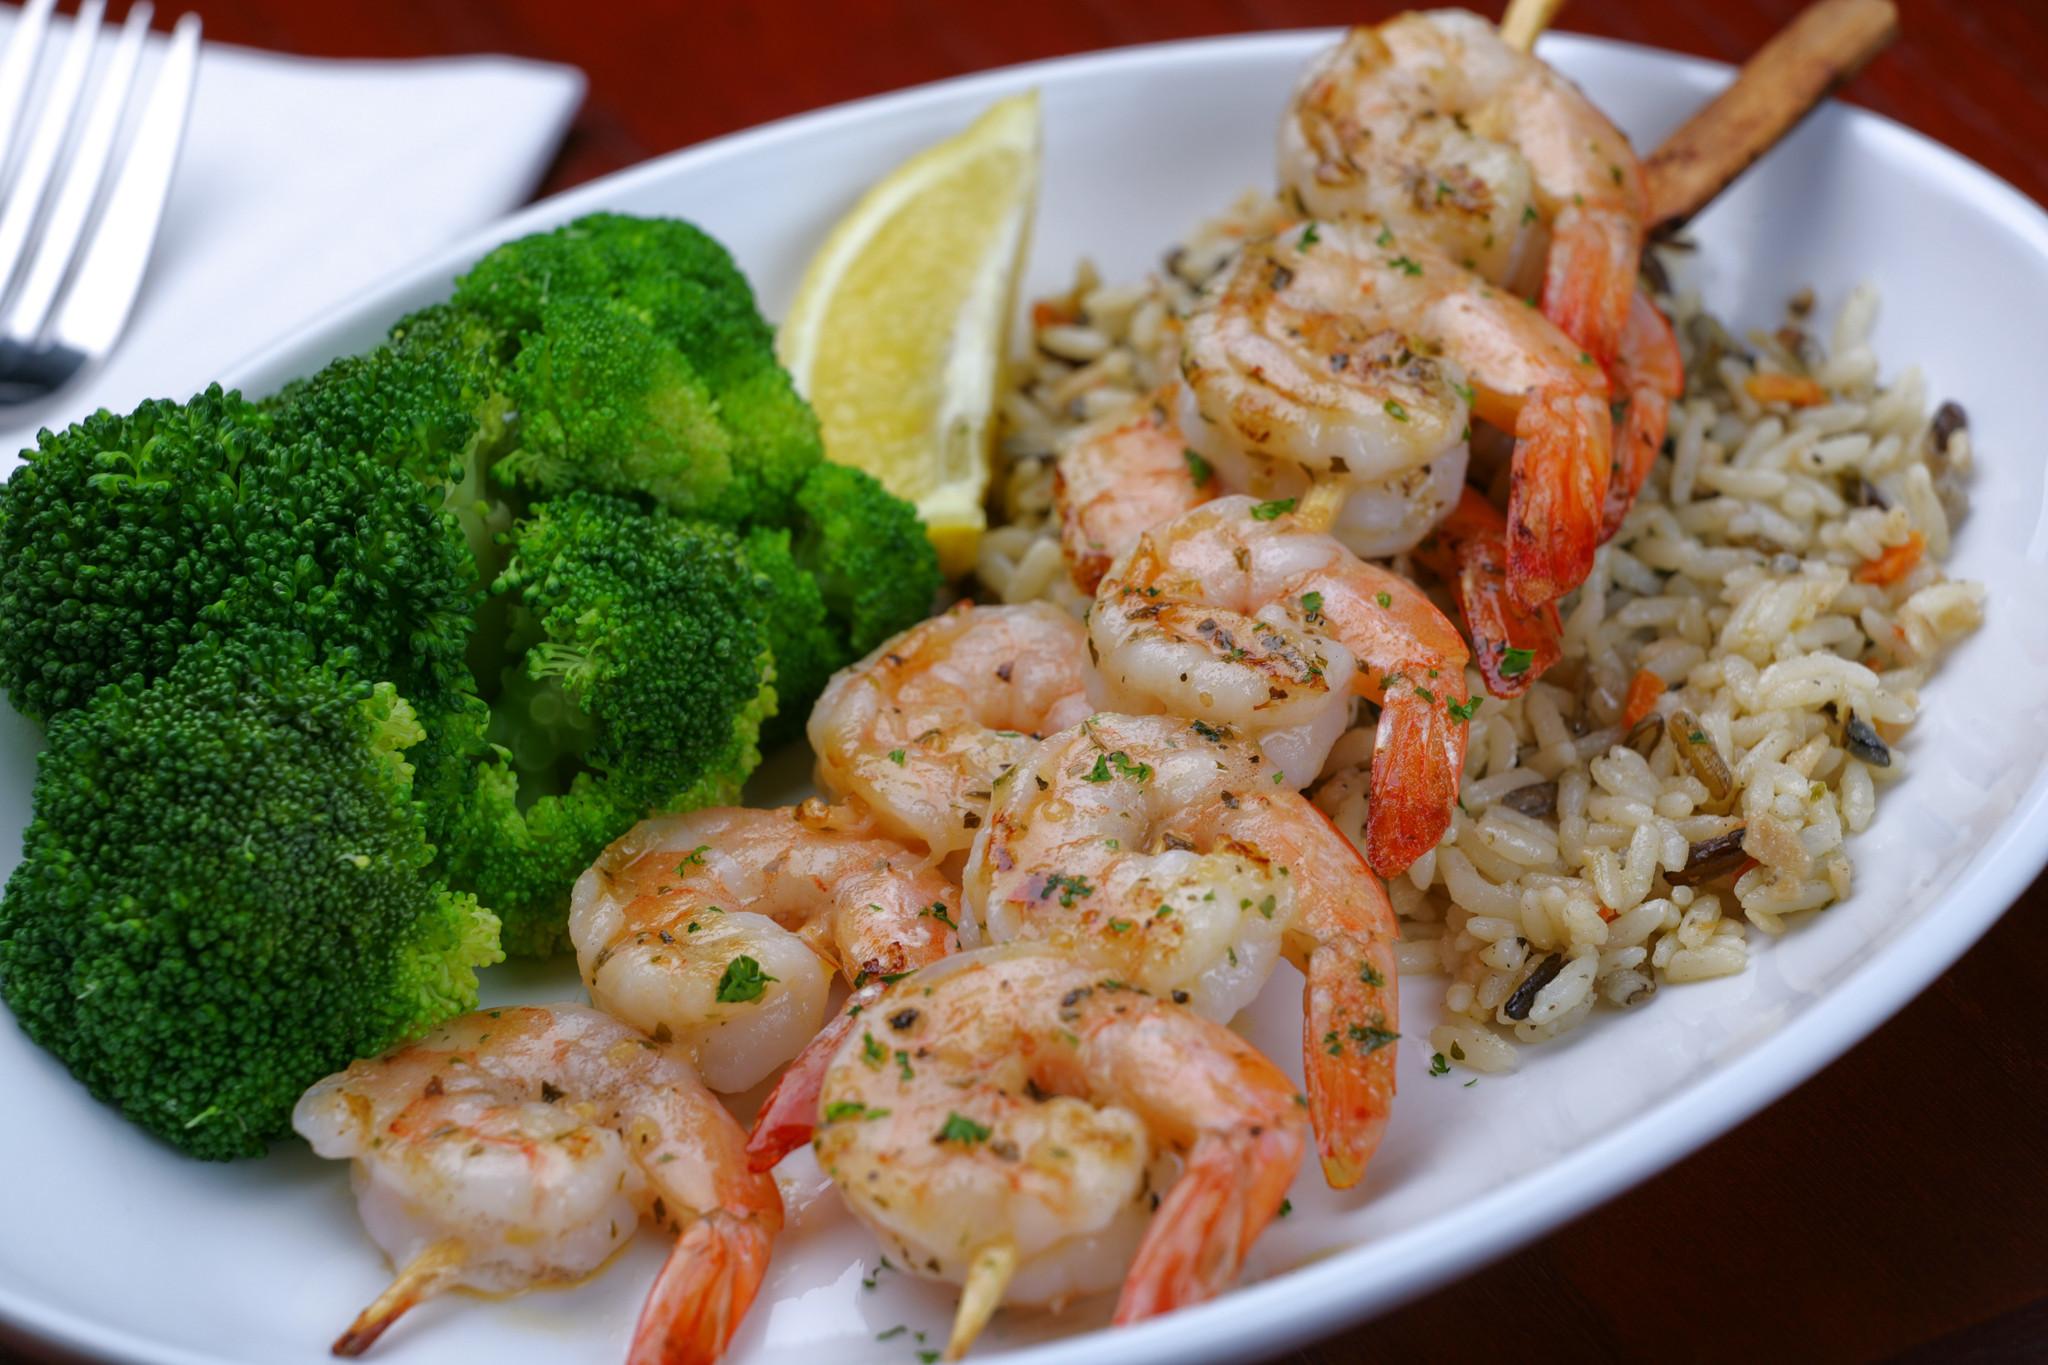 Who are you calling shrimp? Red Lobster bulking up key shellfish dishes - Orlando Sentinel